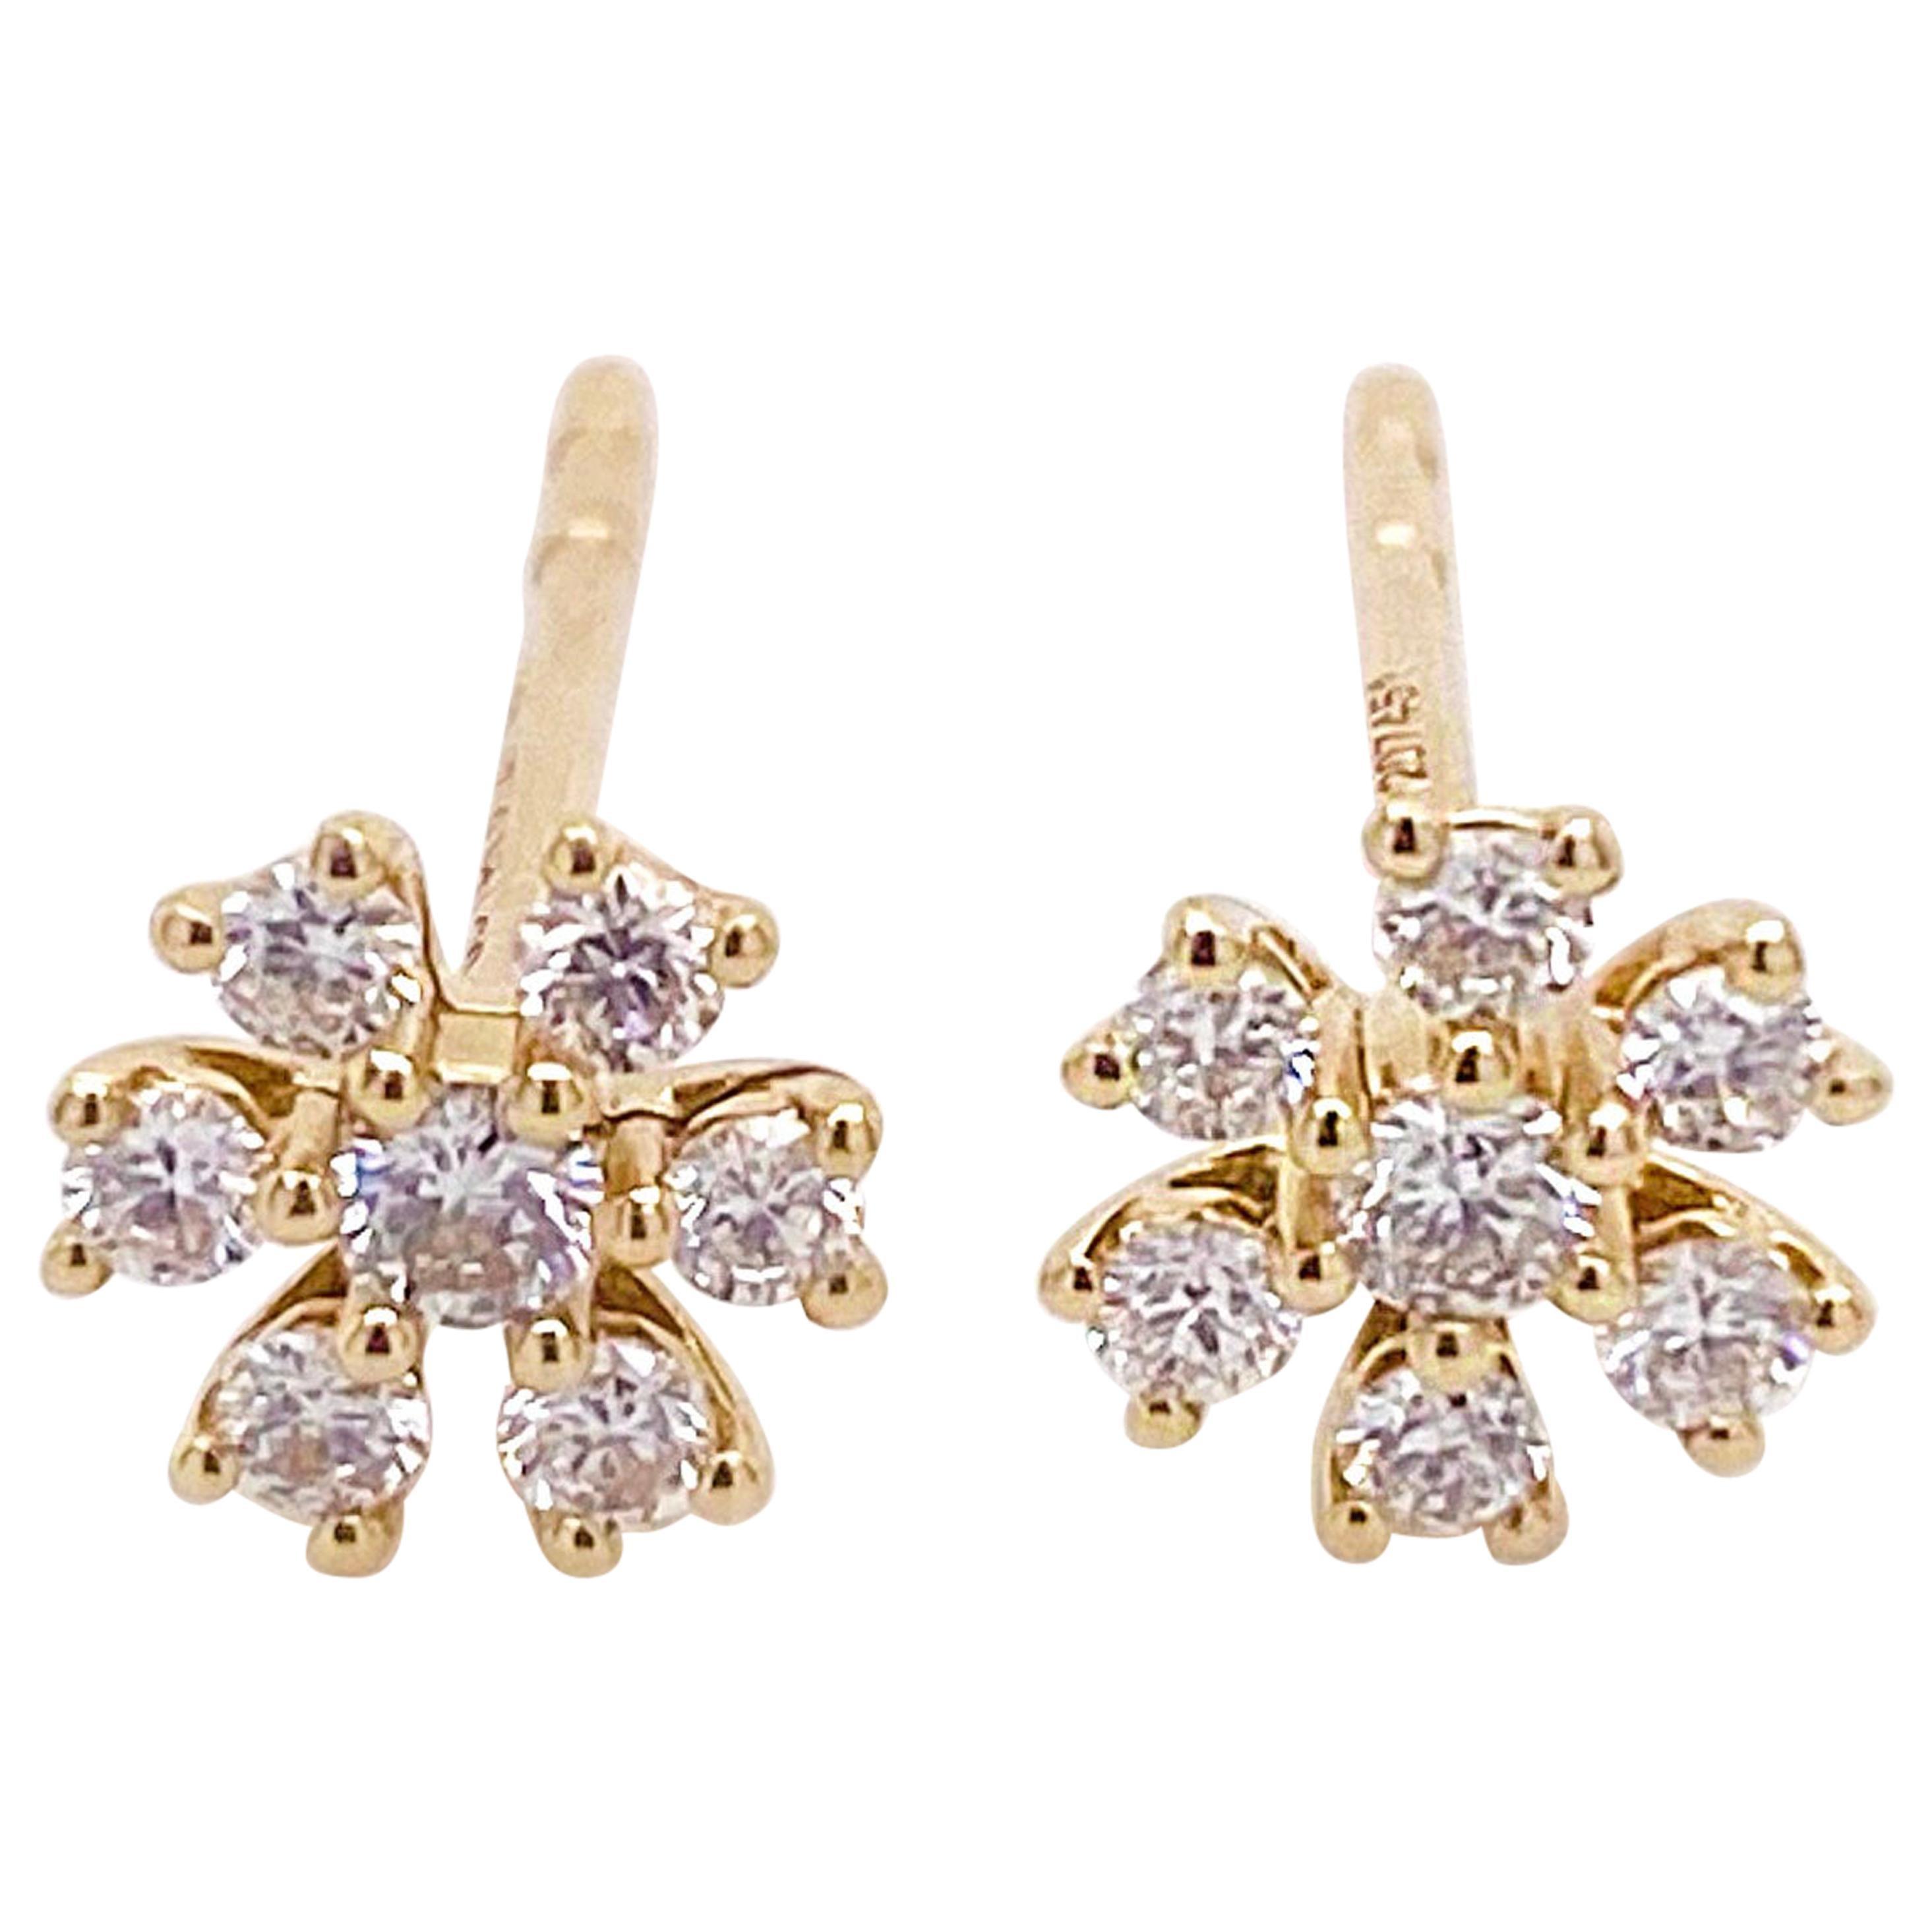 Diamond Stud Earrings, 14K Yellow Gold Diamond Earrings, Flower Diamond Cluster